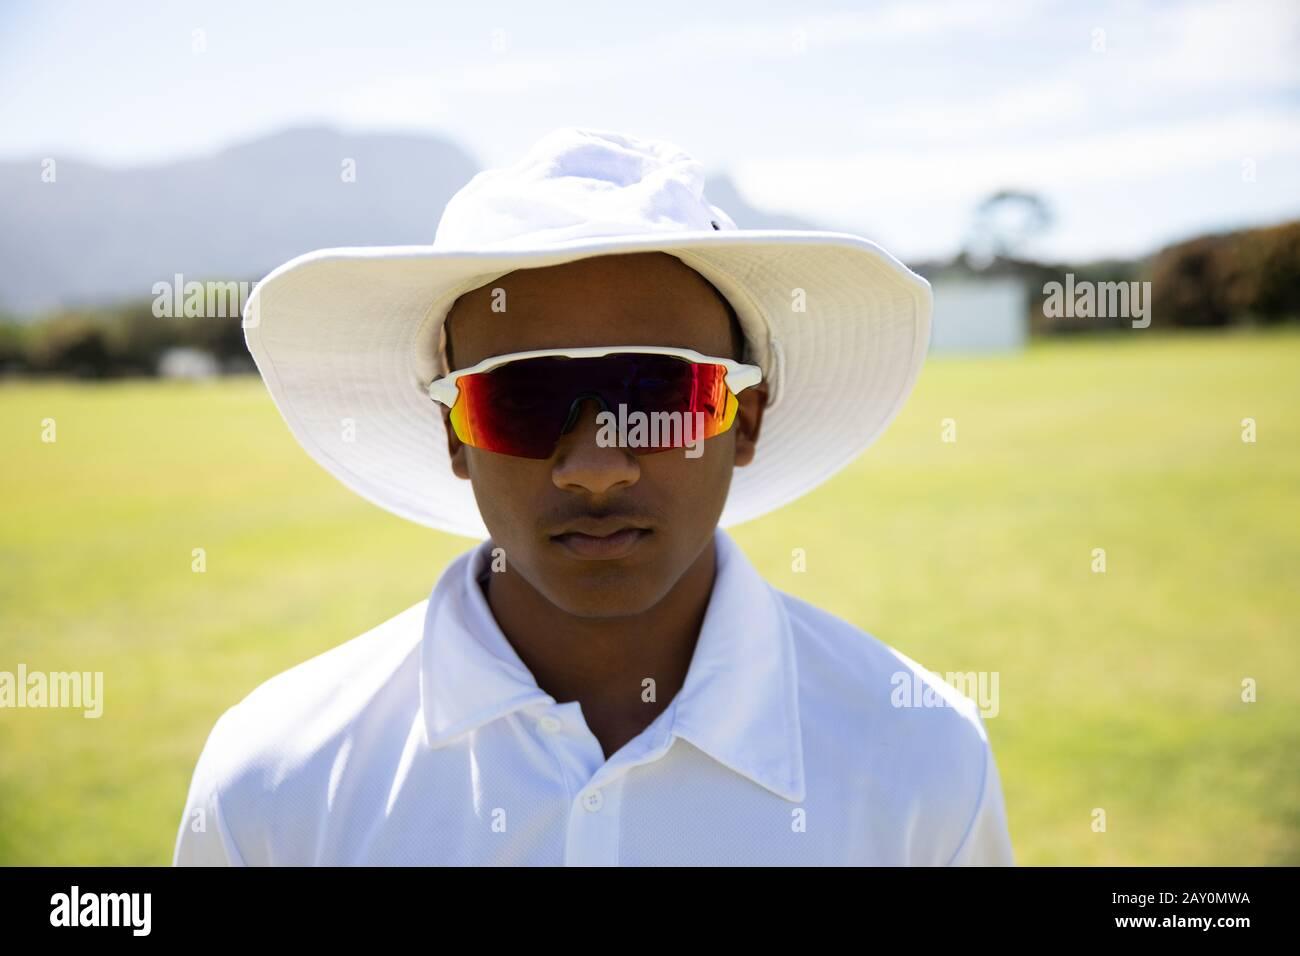 Cricket player looking at the camera Stock Photo